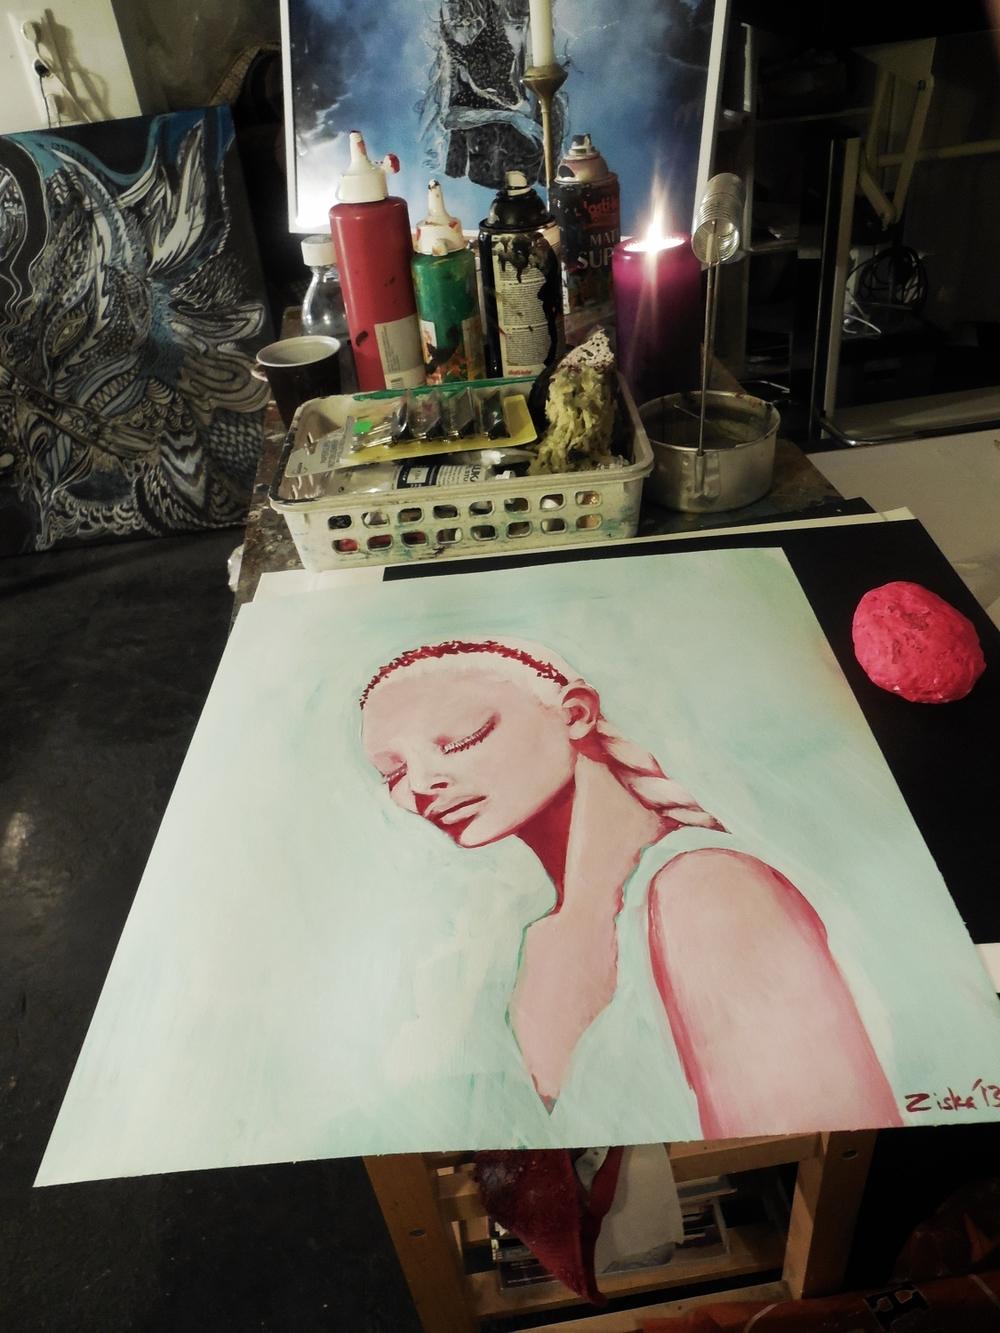 From art maraþon 2013